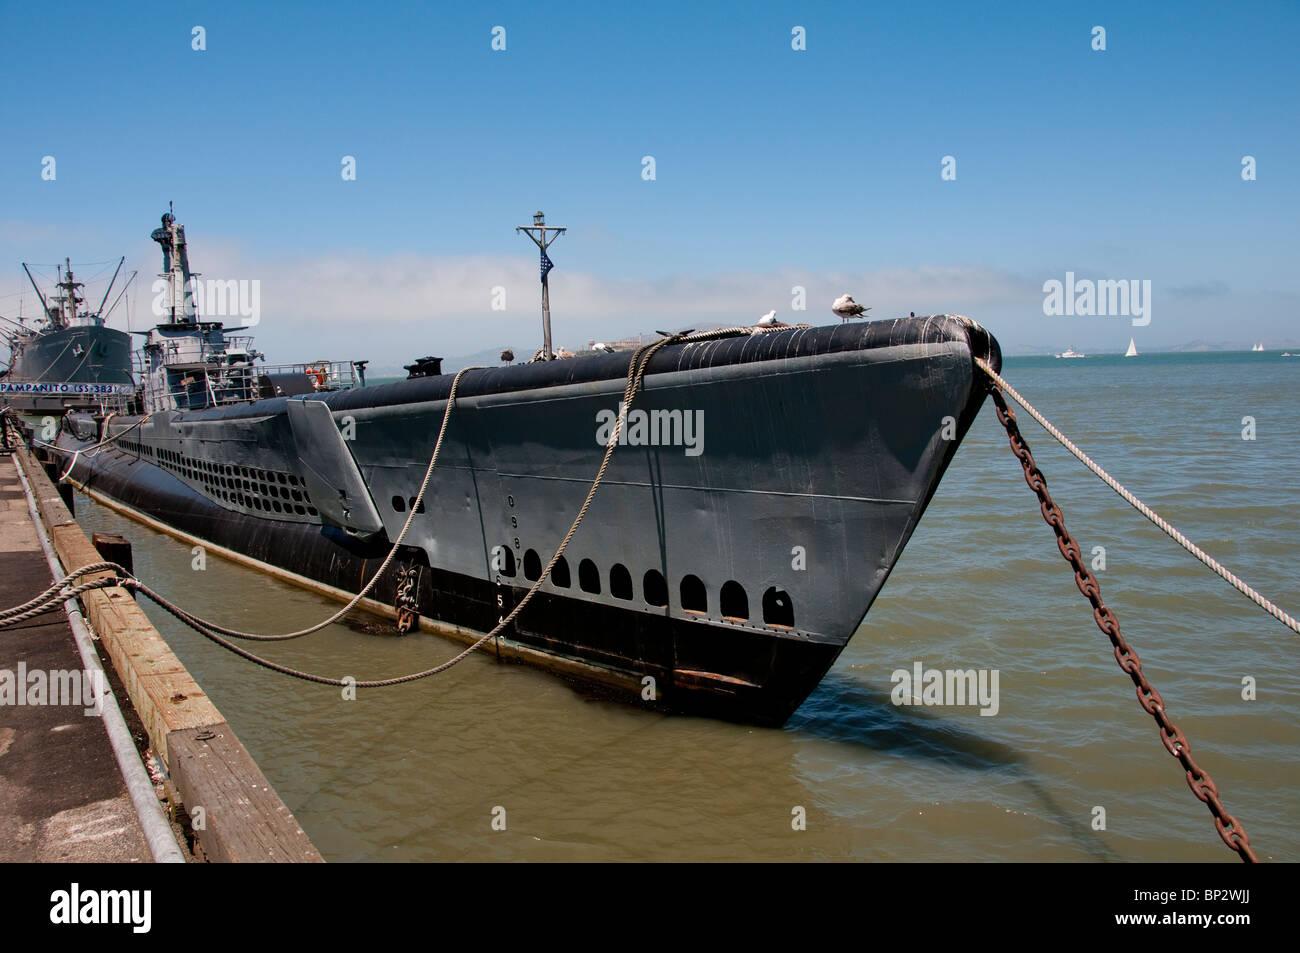 San Francisco: WWII submarino Pampanito en Fisherman's Wharf. Foto copyright Lee Foster. Foto # casanf104169 Imagen De Stock